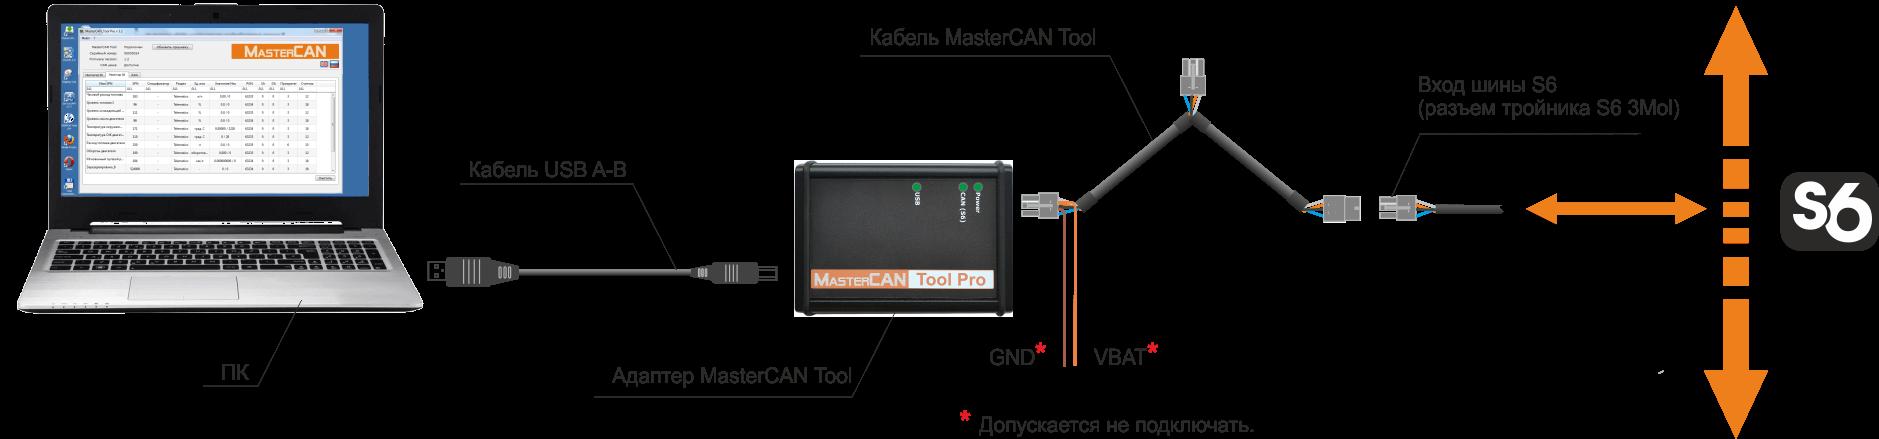 Подключение MasterCAN Tool по Технологии S6